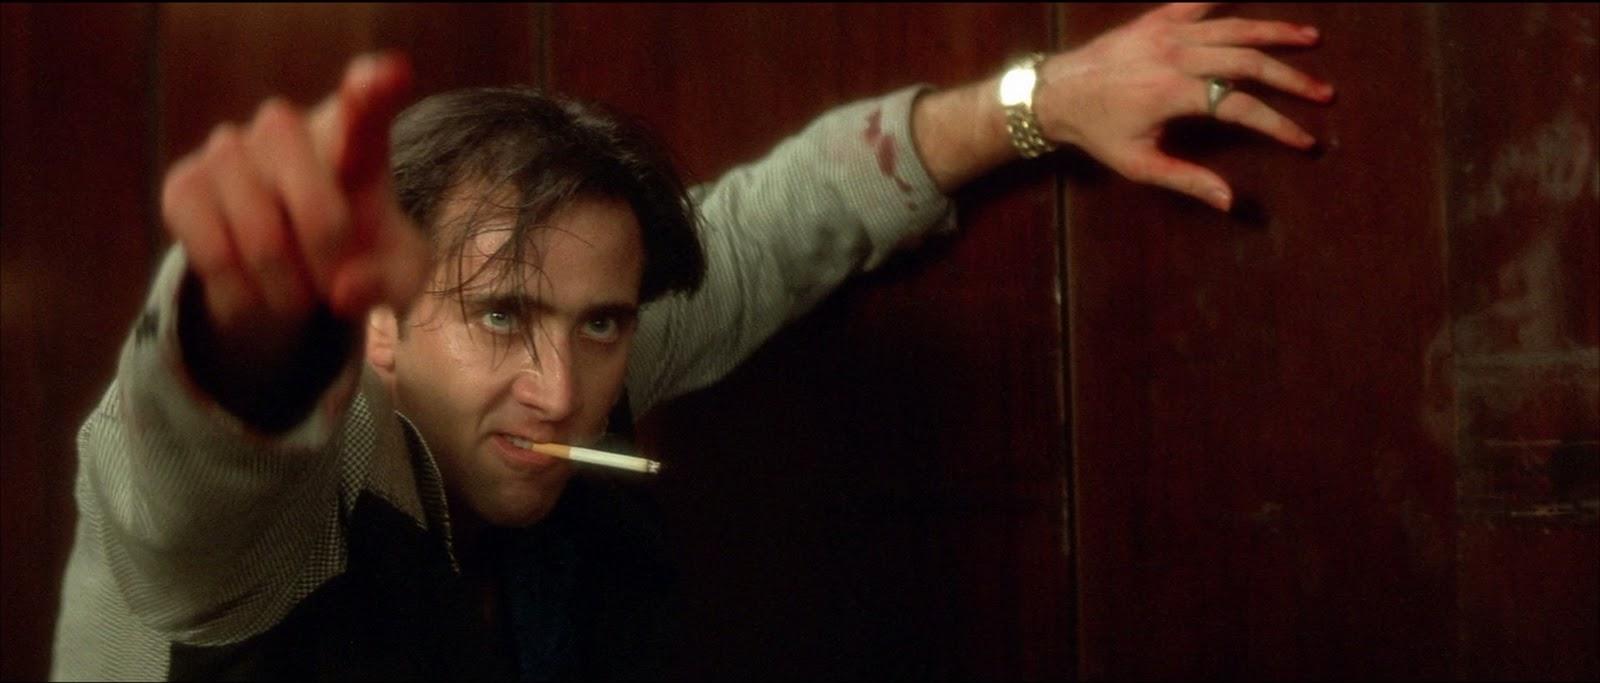 David Lynch, Wild at Heart, Nicolas Cage, Laura Dern